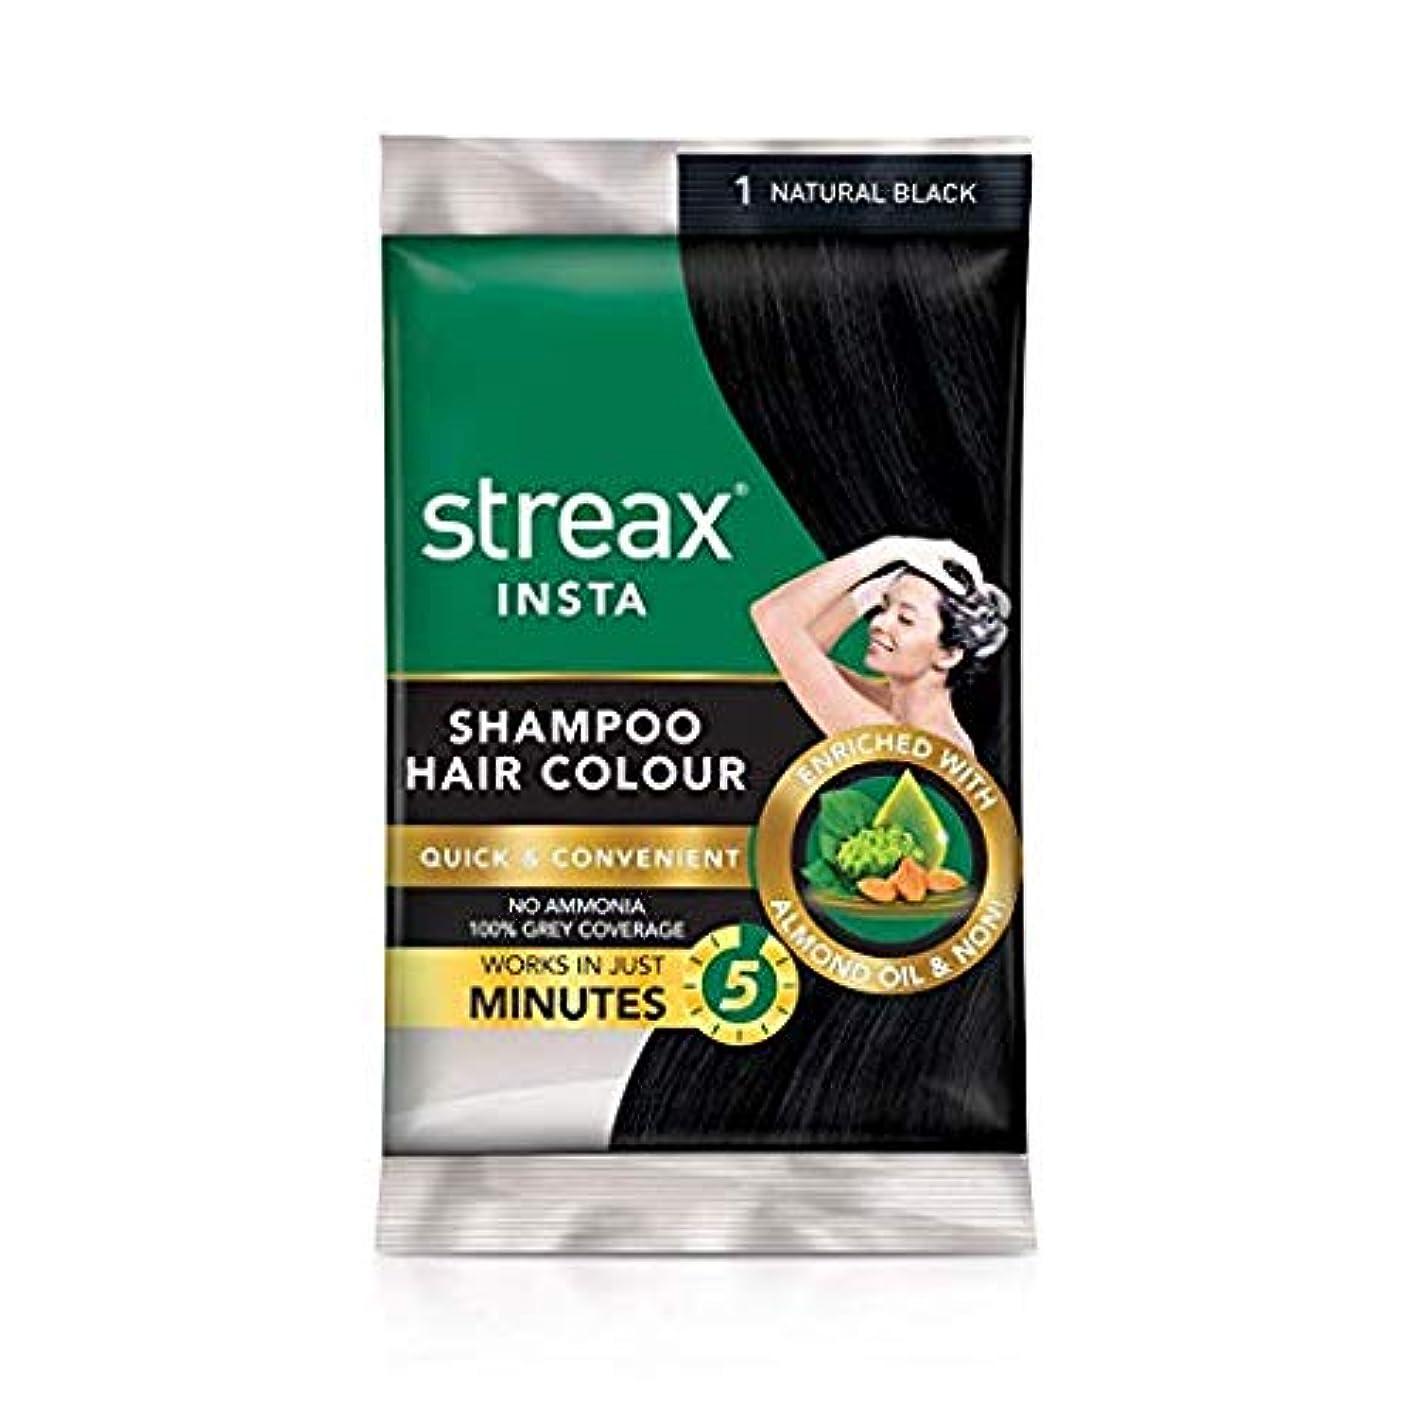 自動化不定罰Omg-deal -Pack of 5 Streax Shampoo Hair Colour Natural Black